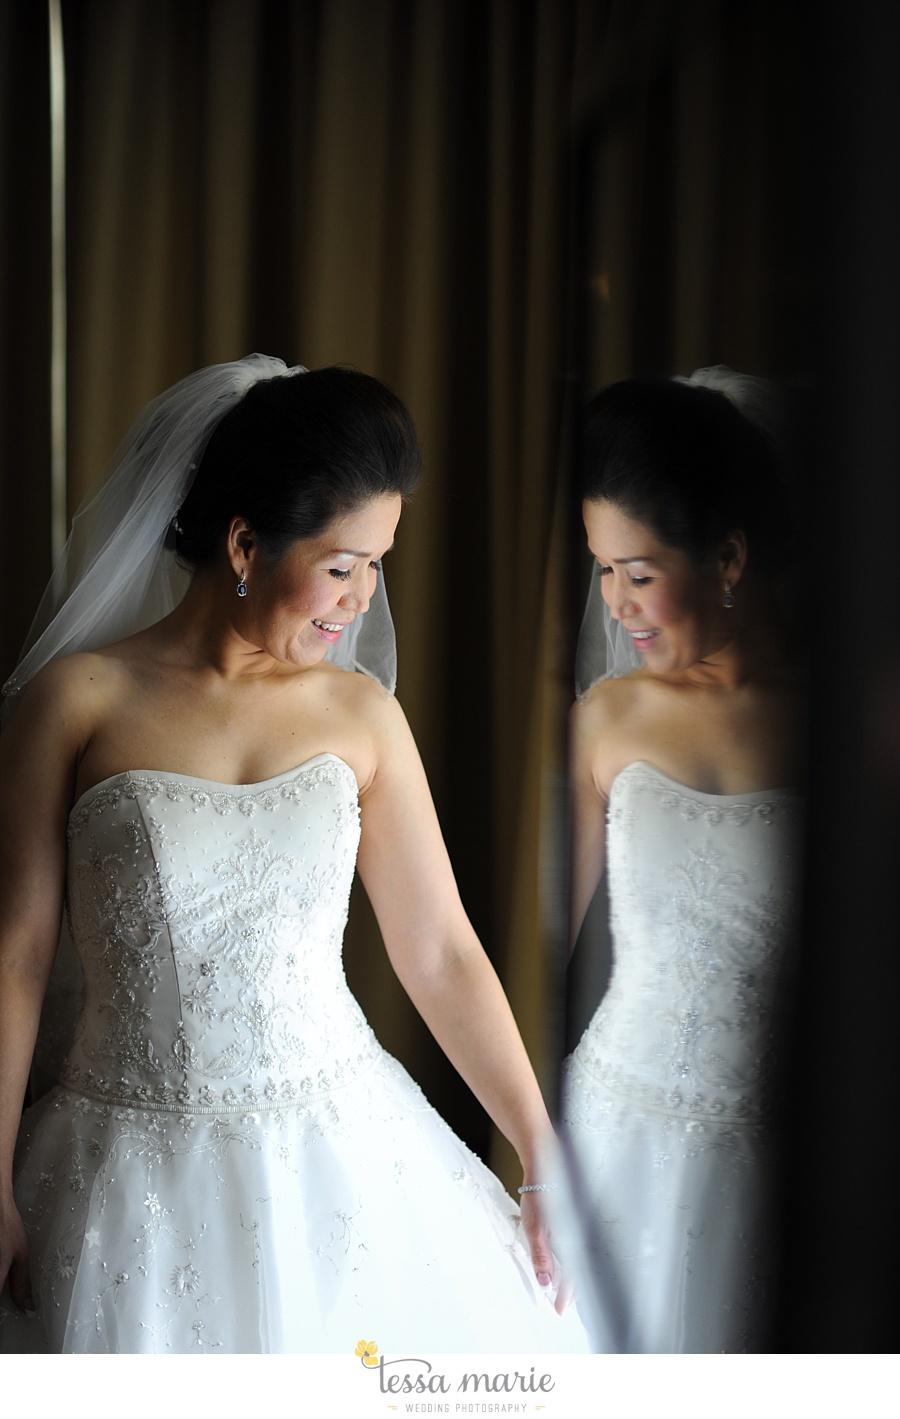 evergreen_resort_wedding_reception_stone_mountain_tessa_marie_weddings_0003